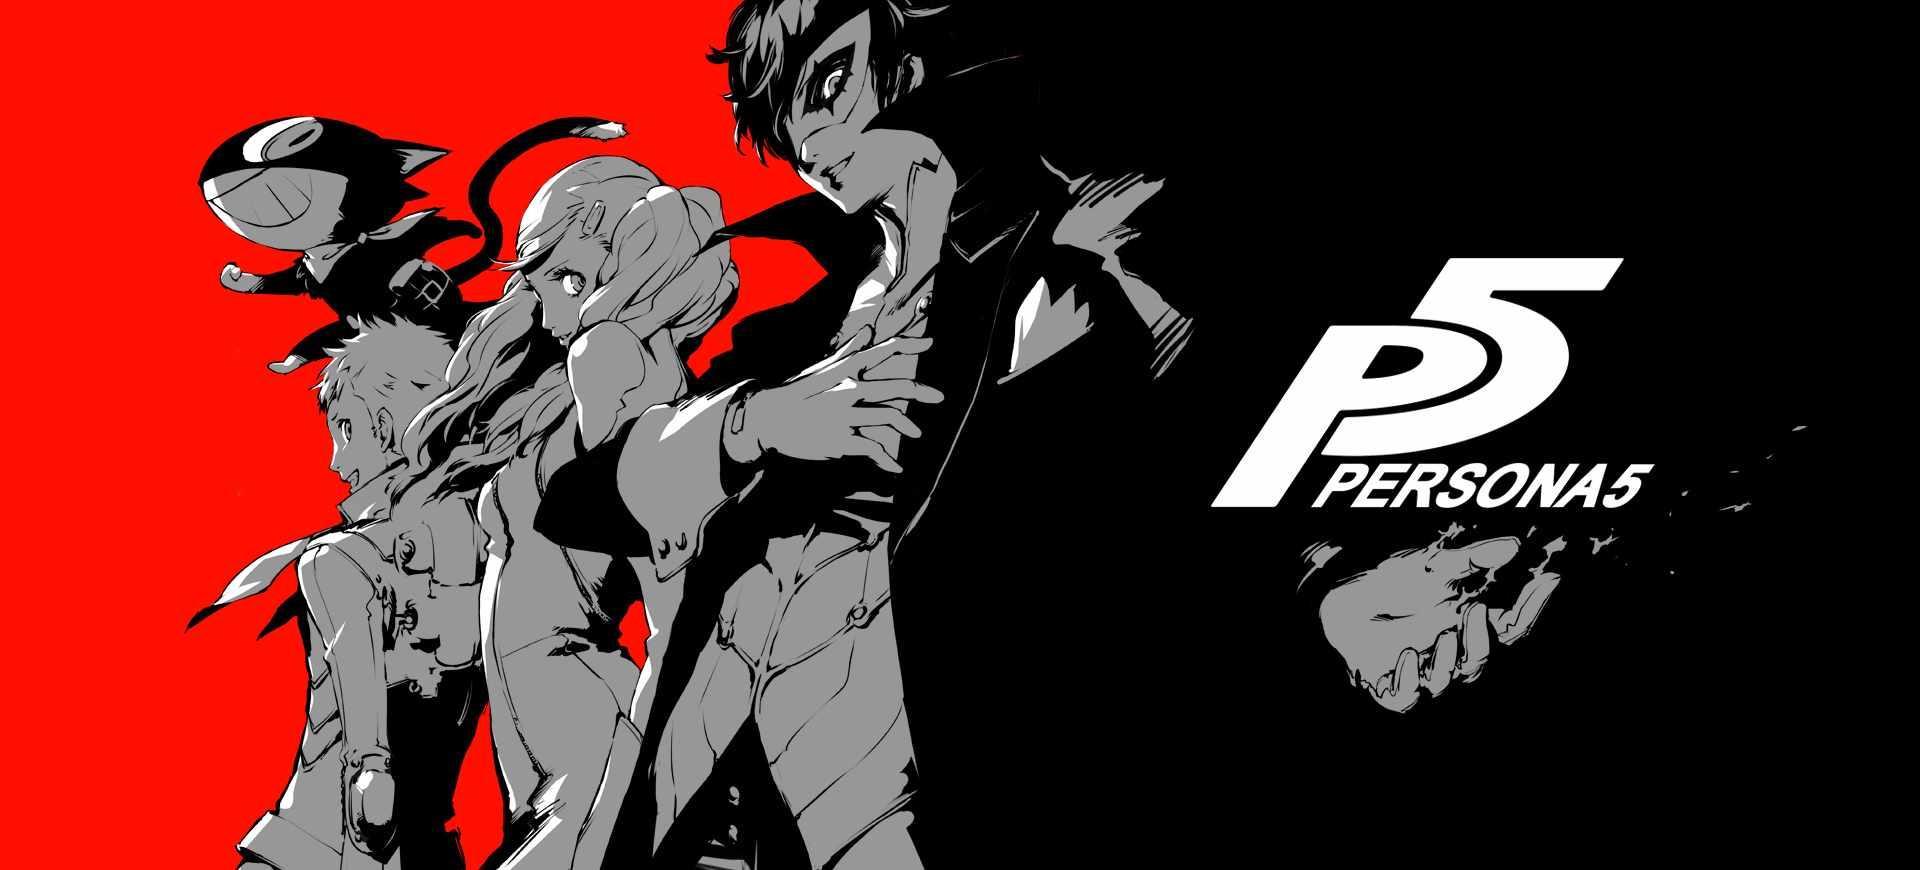 E3 2016: Persona 5 đầy cuốn hút qua trailer mới– Tin Game